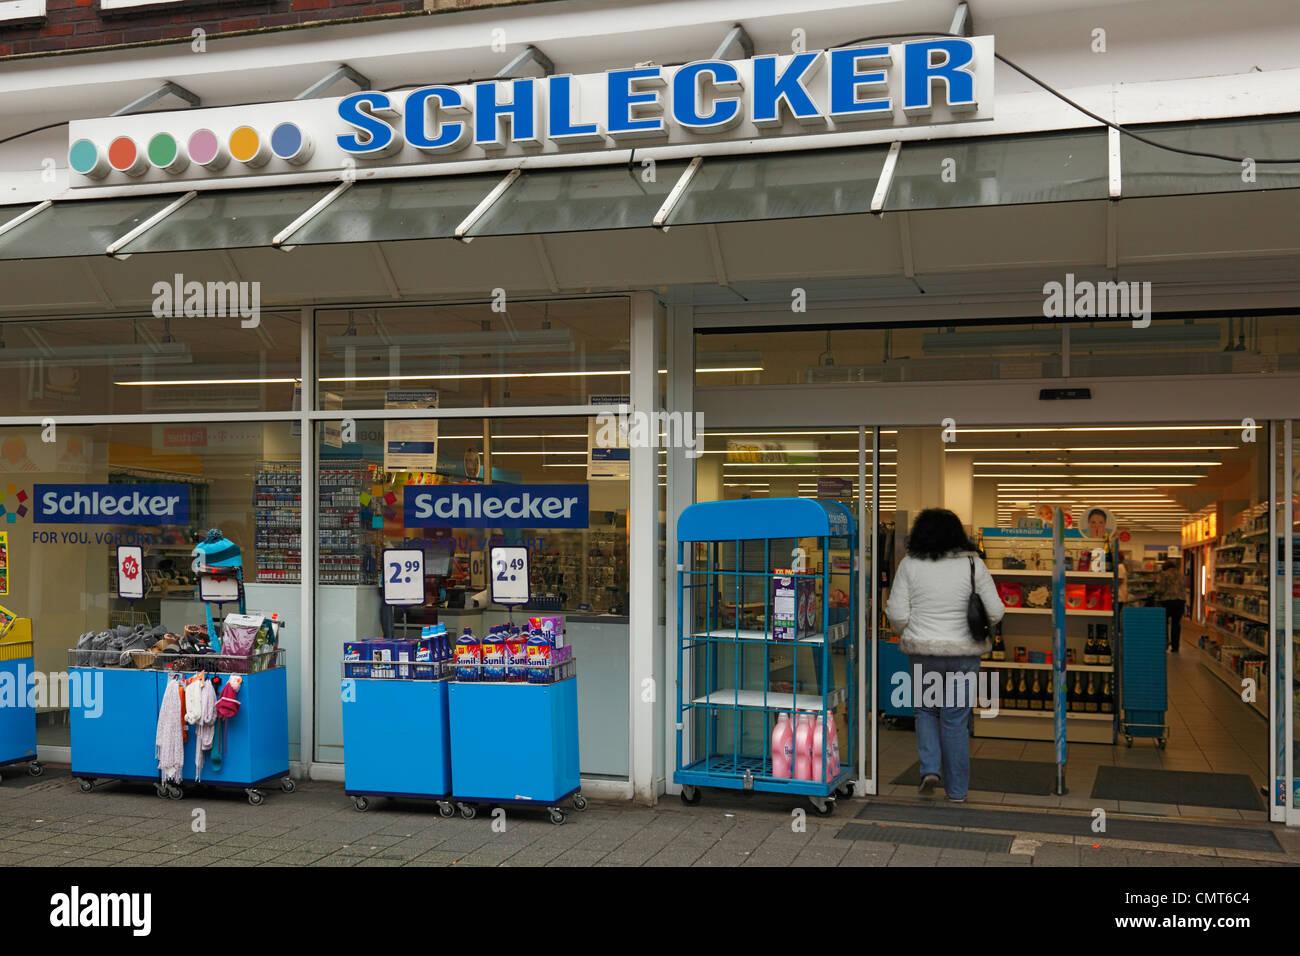 insolvency drugstore Schlecker, mass dismissal, department store, retail shop, retail store chain, drugstore chain, - Stock Image